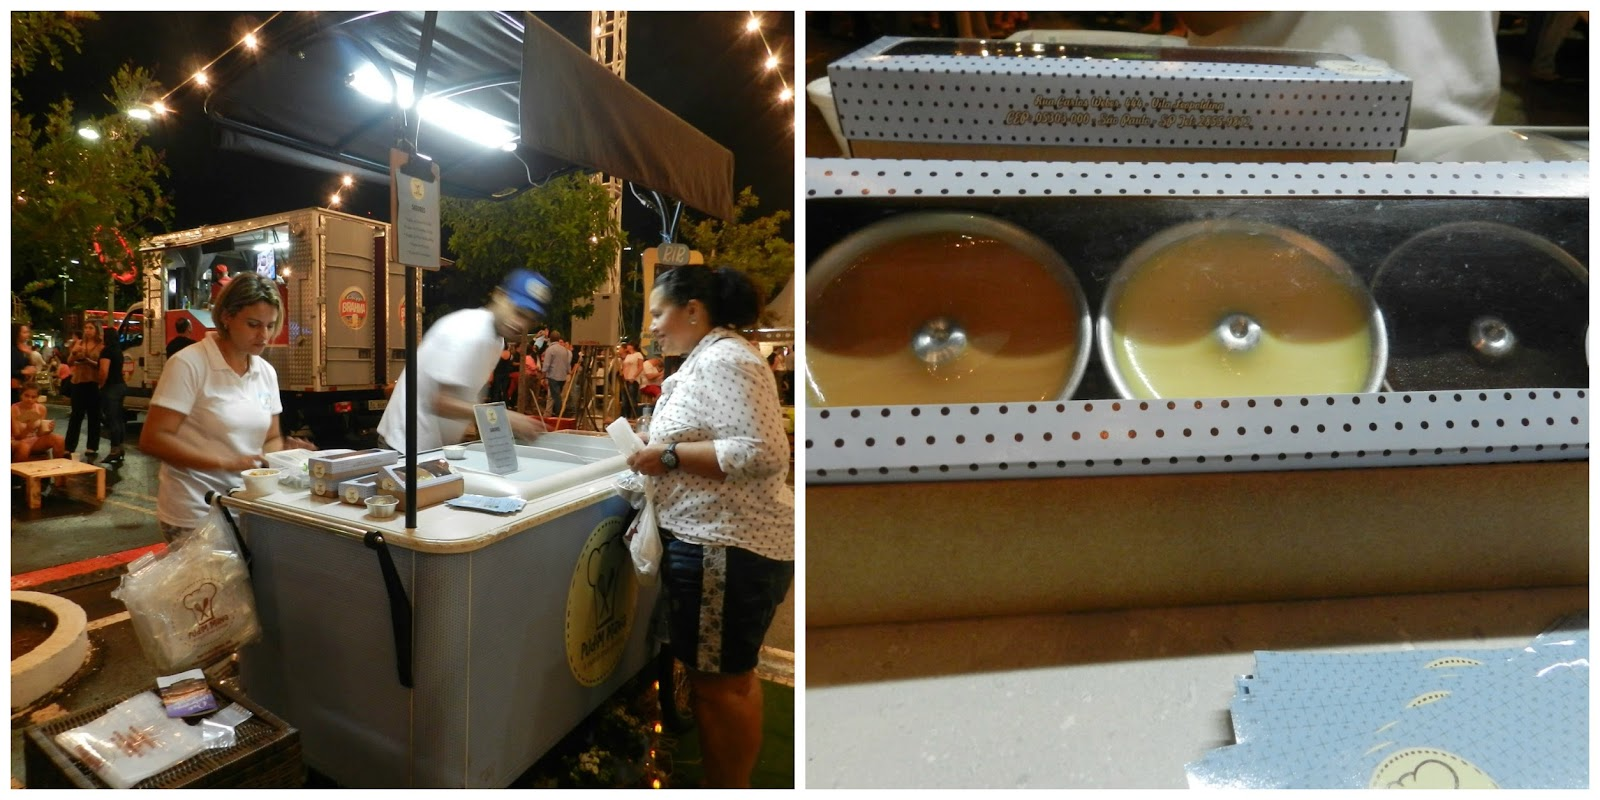 Food Truck Festival Parque D. Pedro Shooping em Campinas